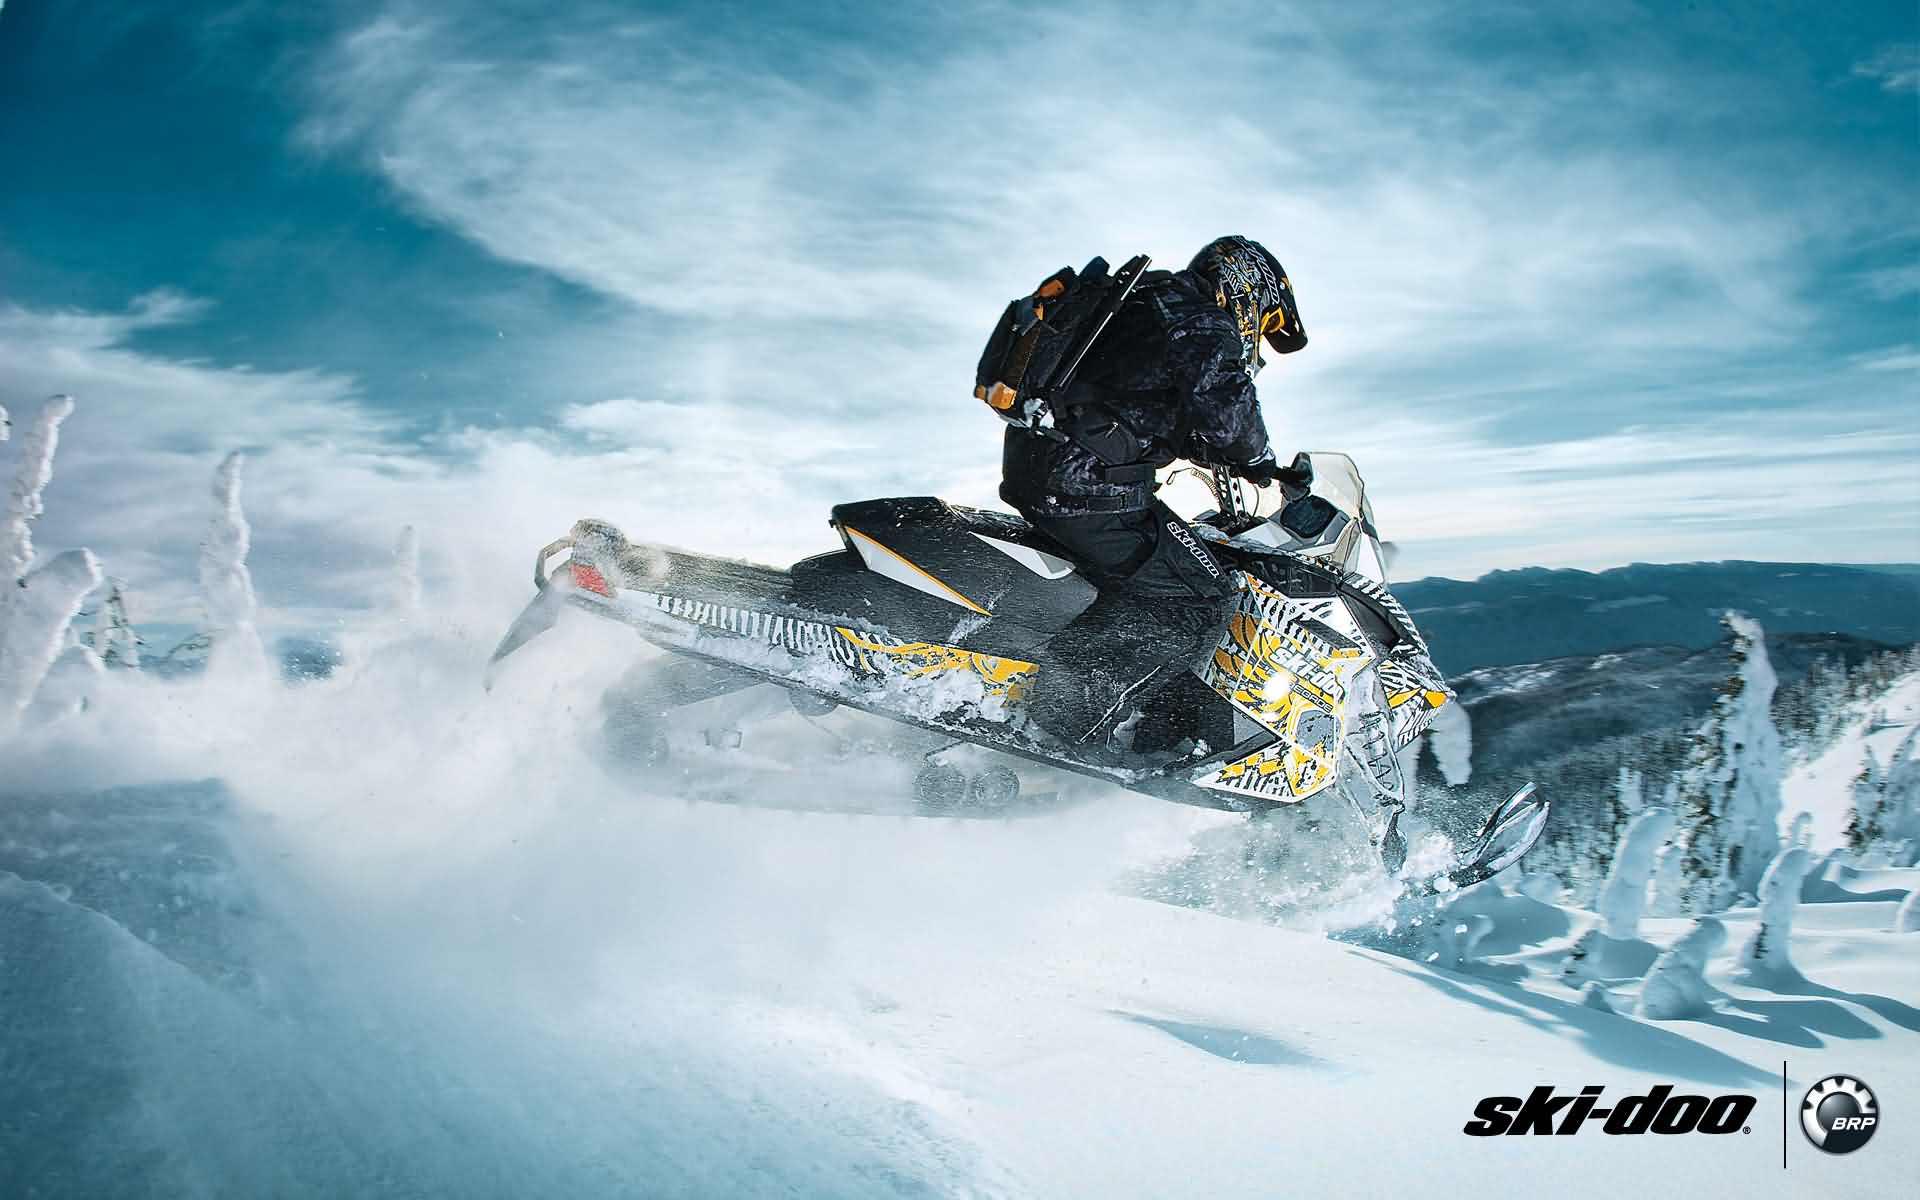 Wallpaper Wednesday: The Snowmobile | TransWorld SNOWboarding